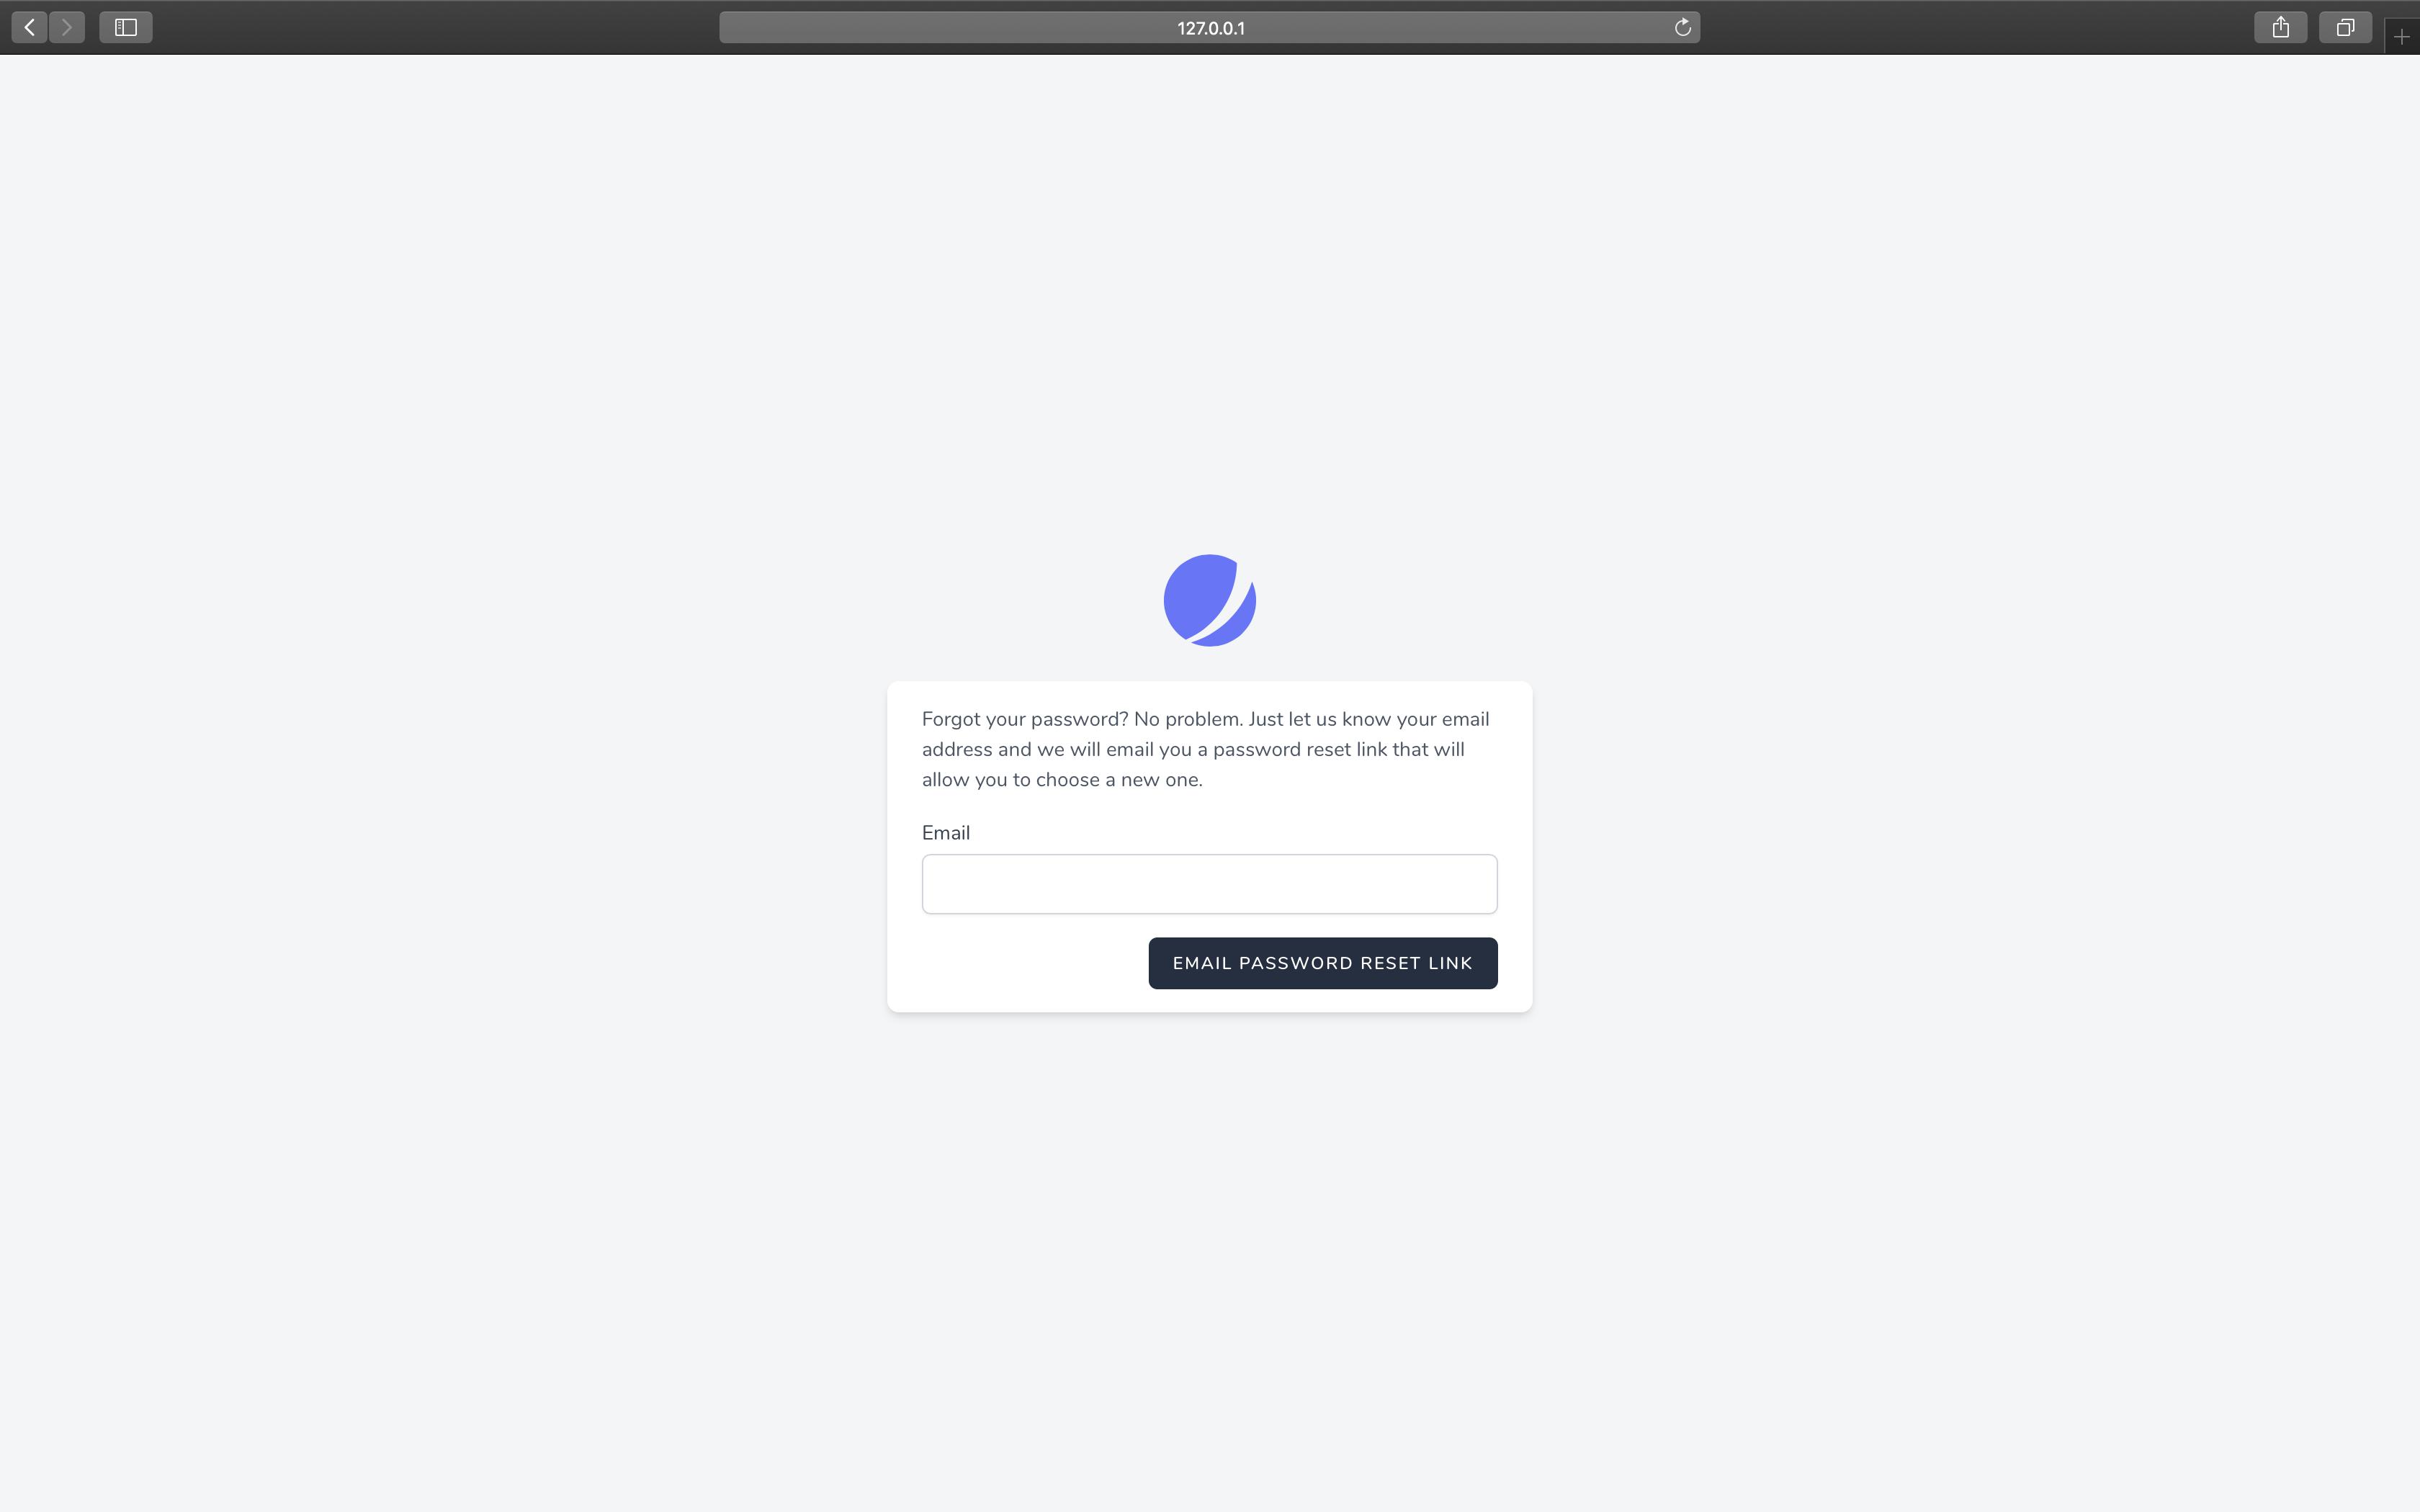 ScreenShot 2020-09-12 4.51.43.png